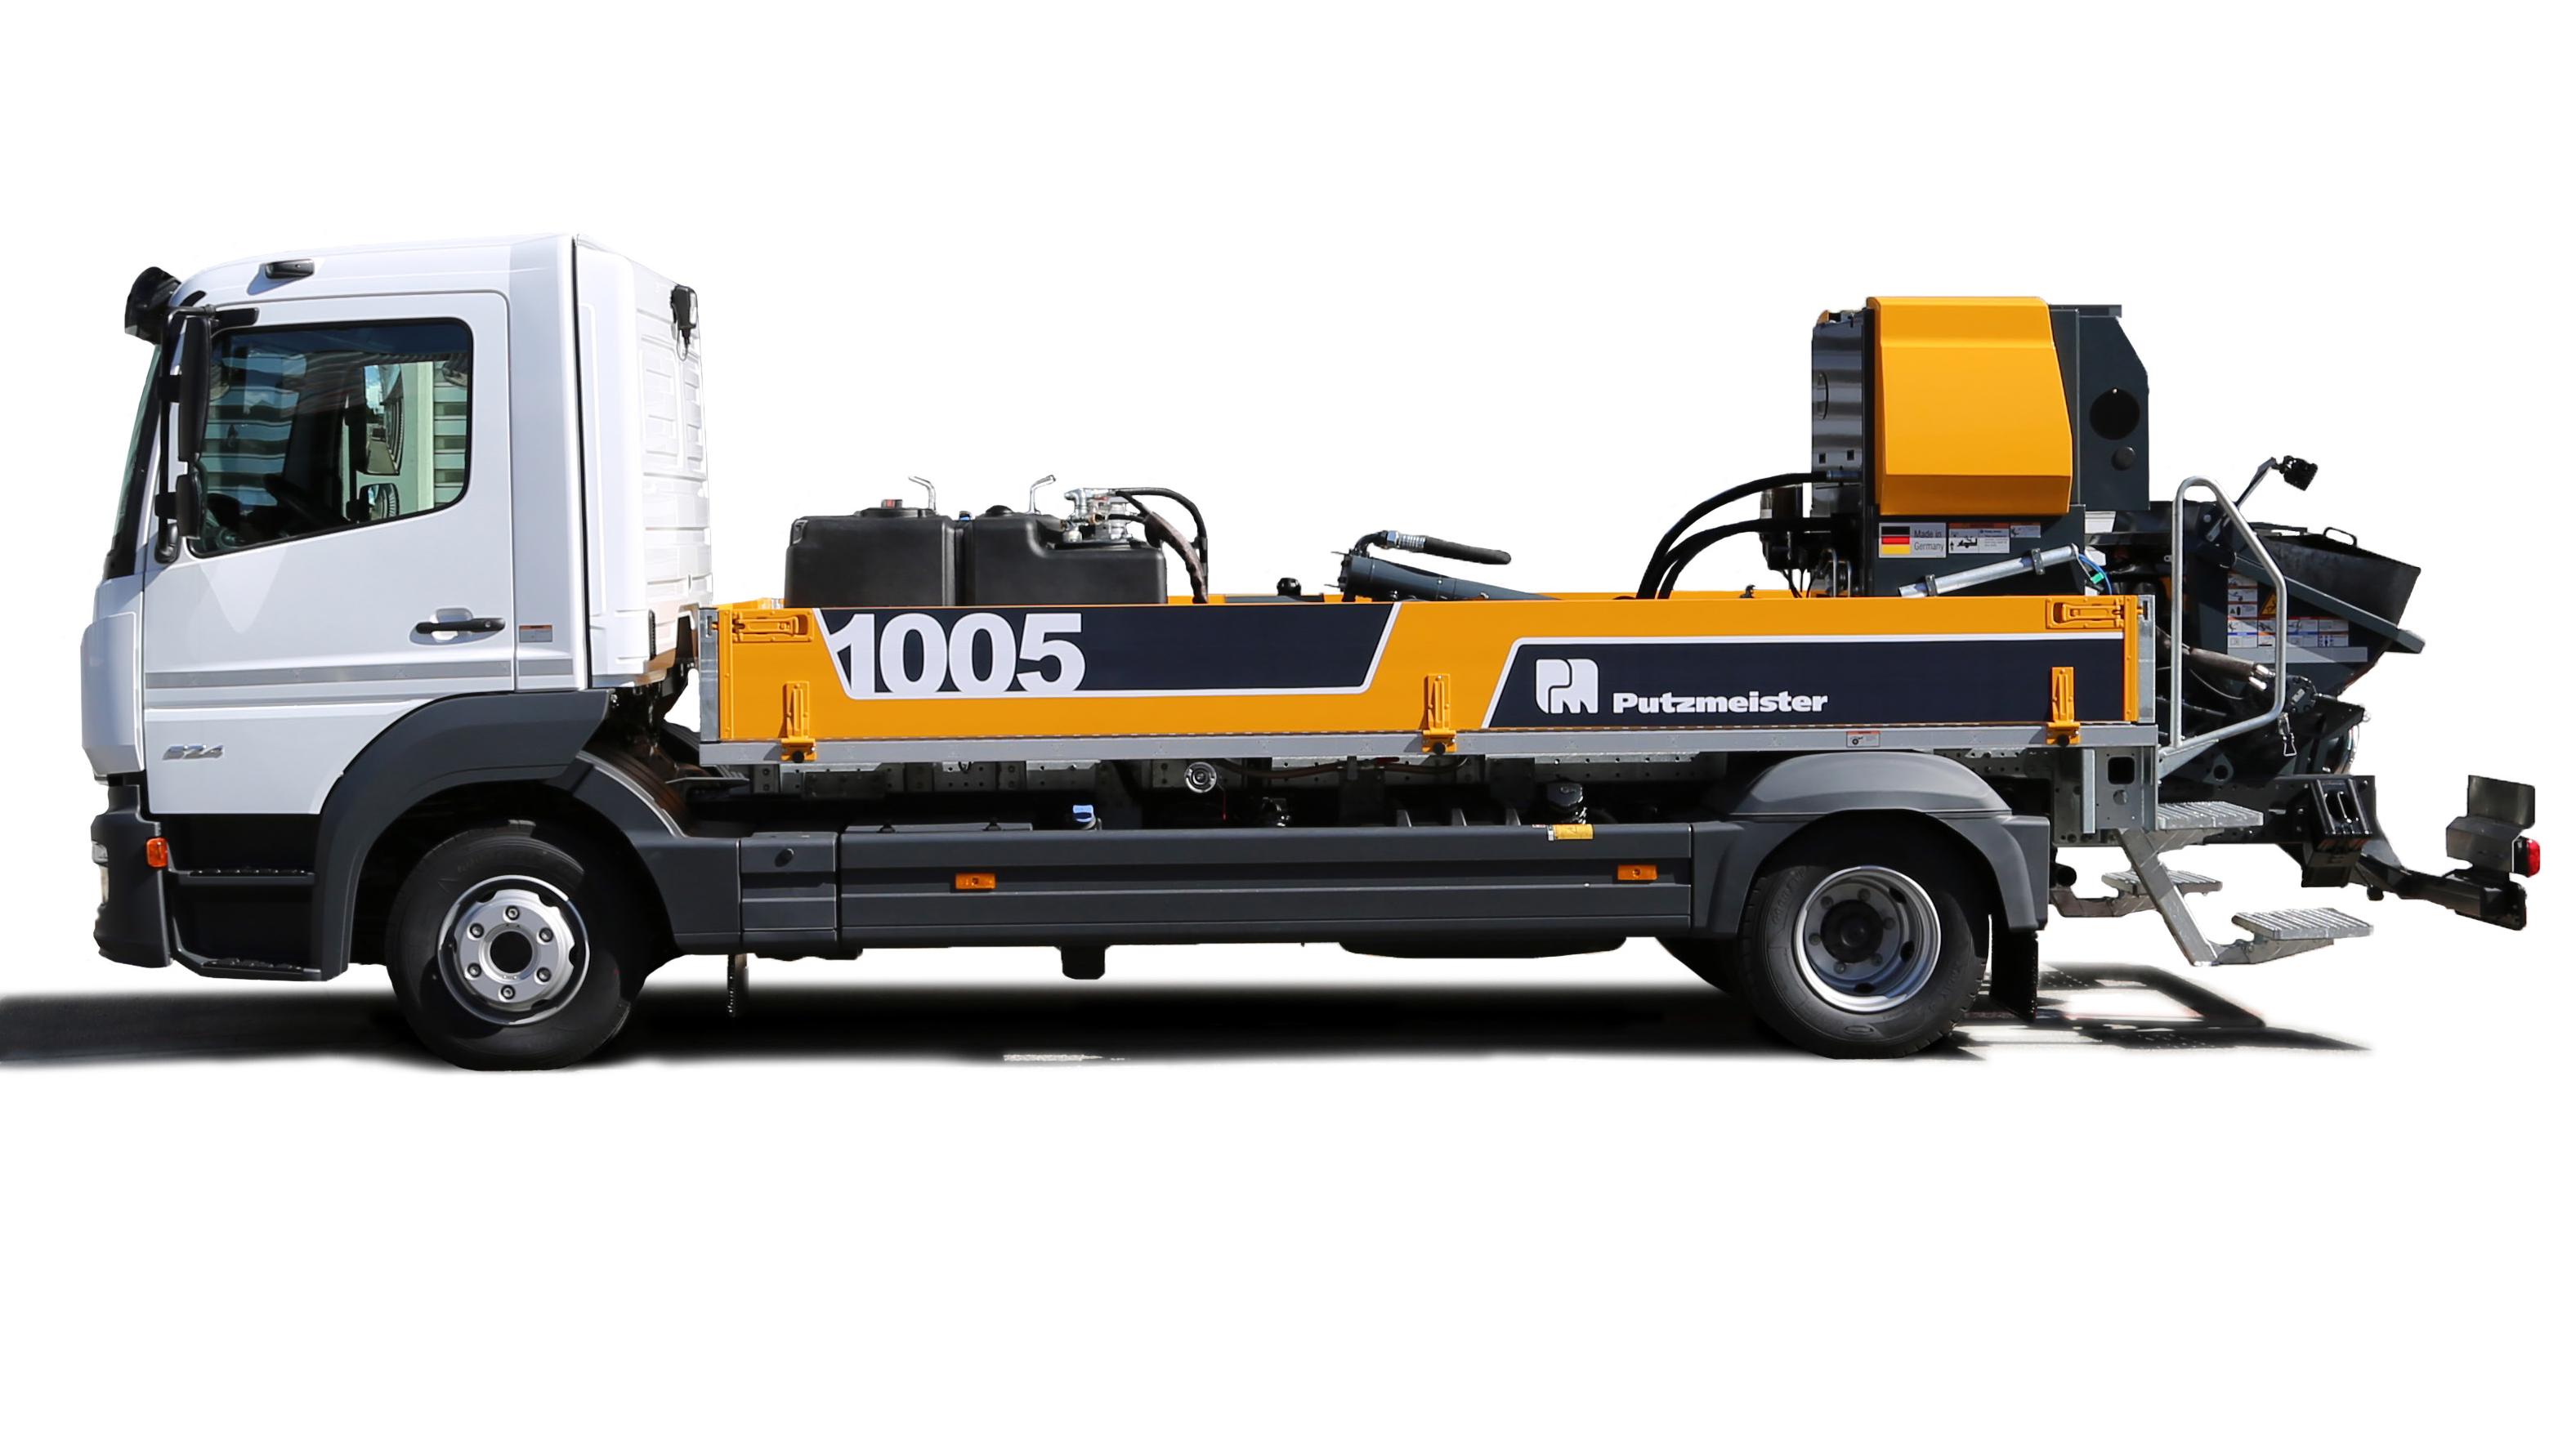 Noua linie de pompe de beton Putzmeister BSF 1005 Moli / BQF 06 Roline